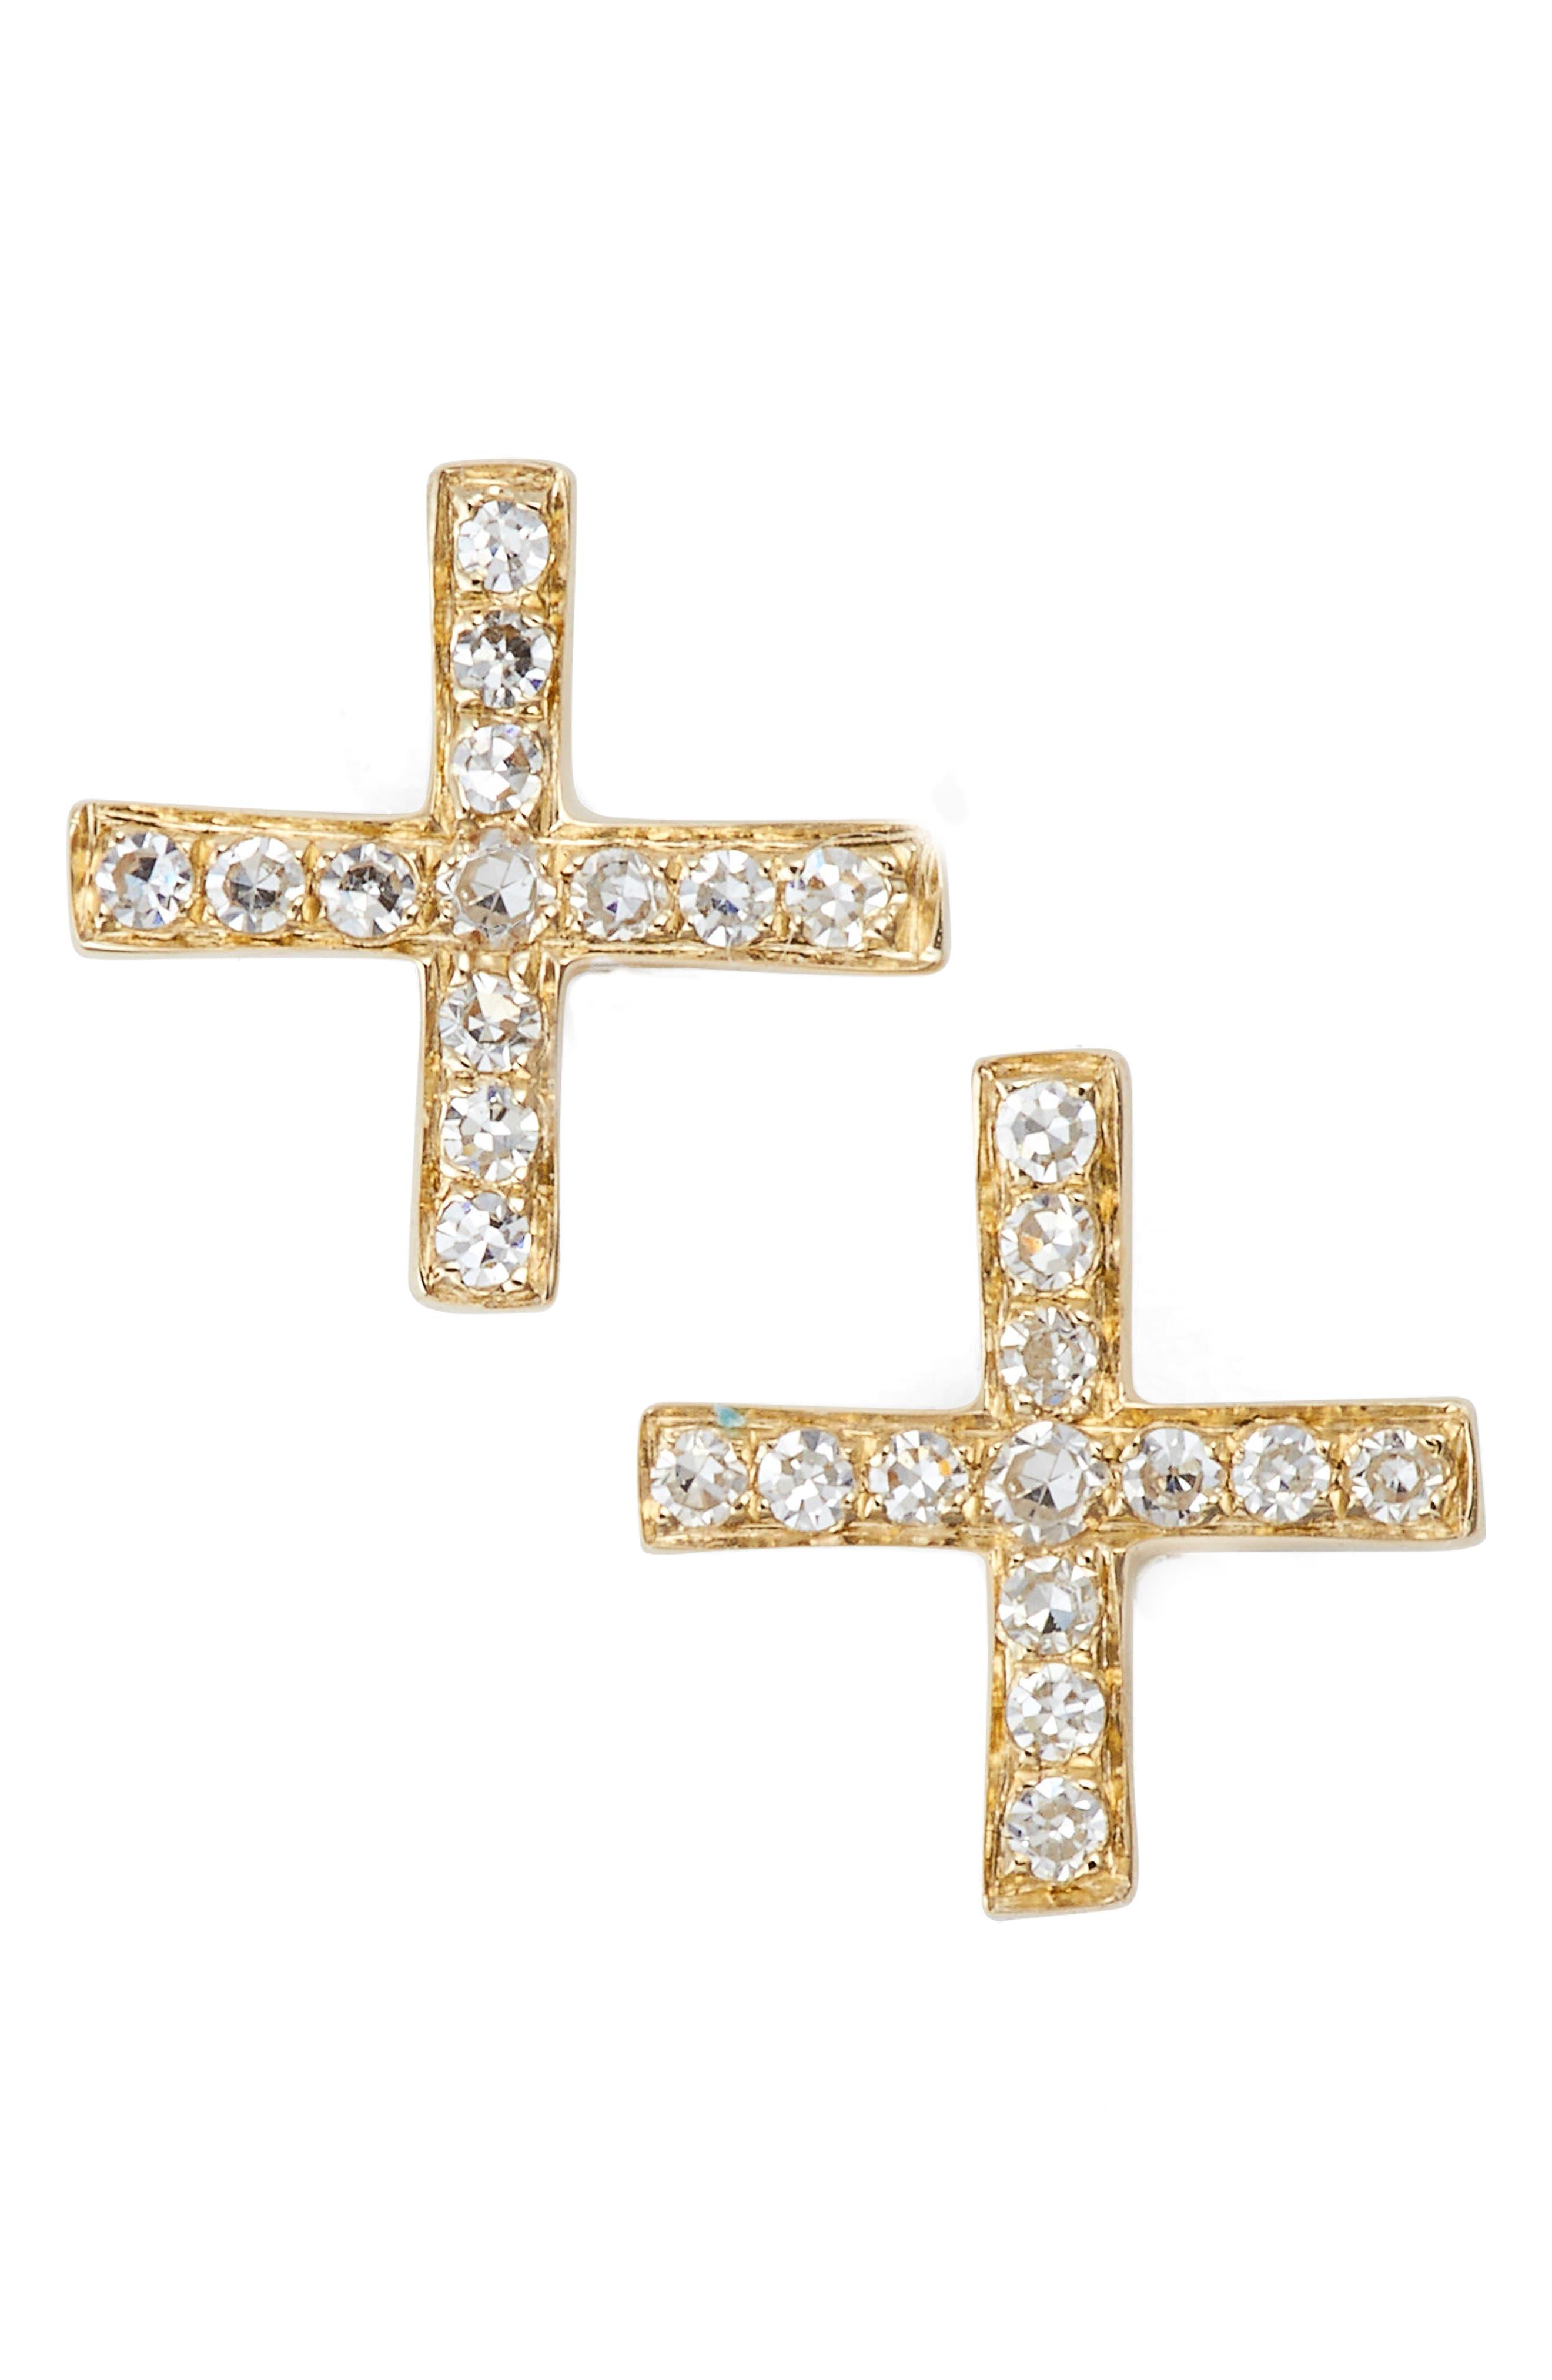 Main Image - EF COLLECTION Diamond X Stud Earrings